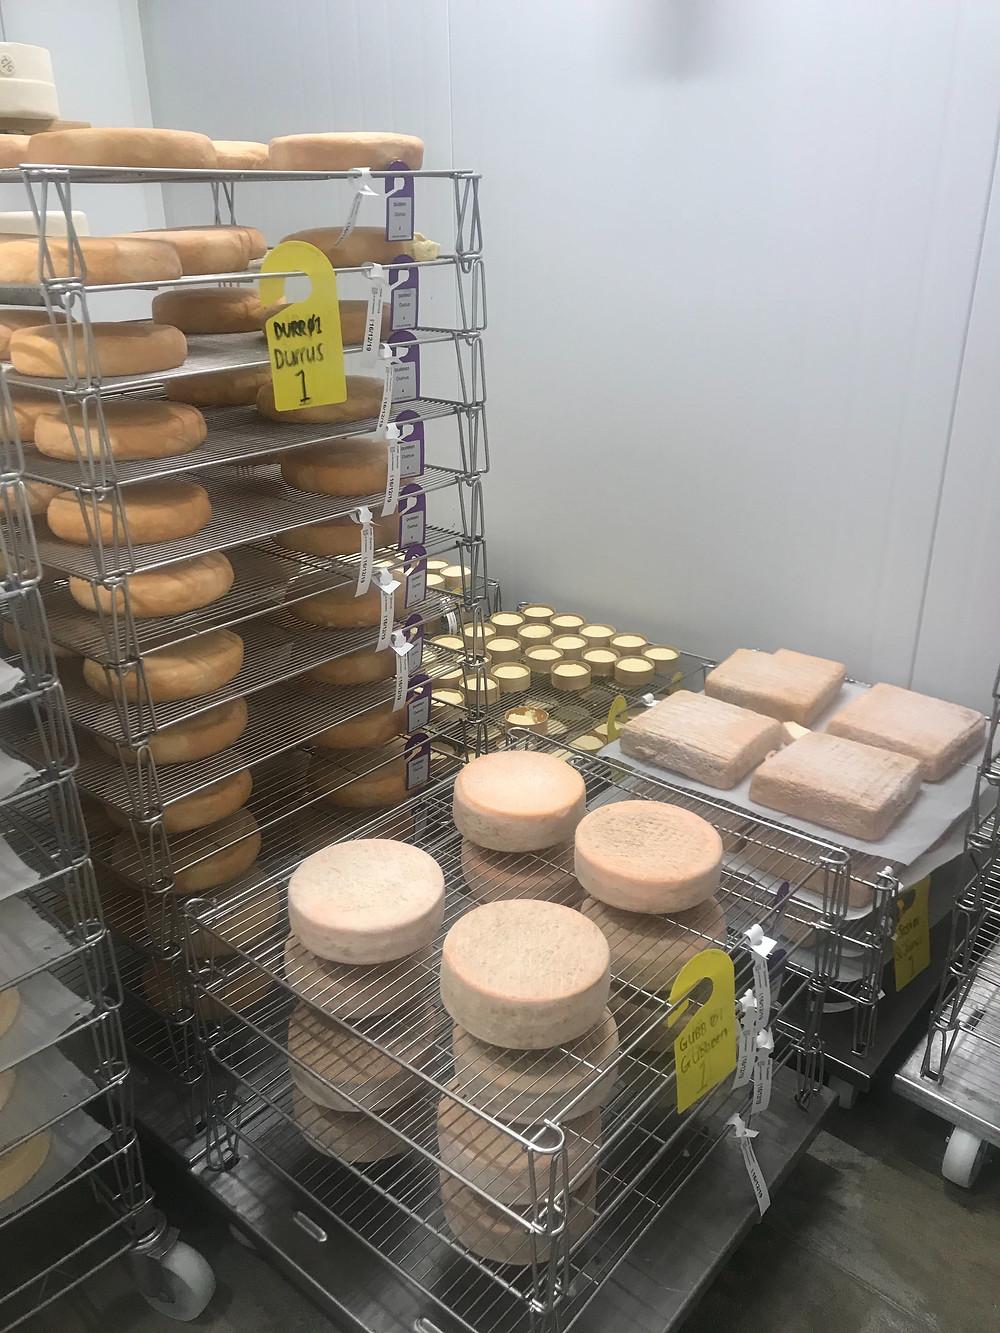 Soft cheeses maturing at Neal's Yard Dairy